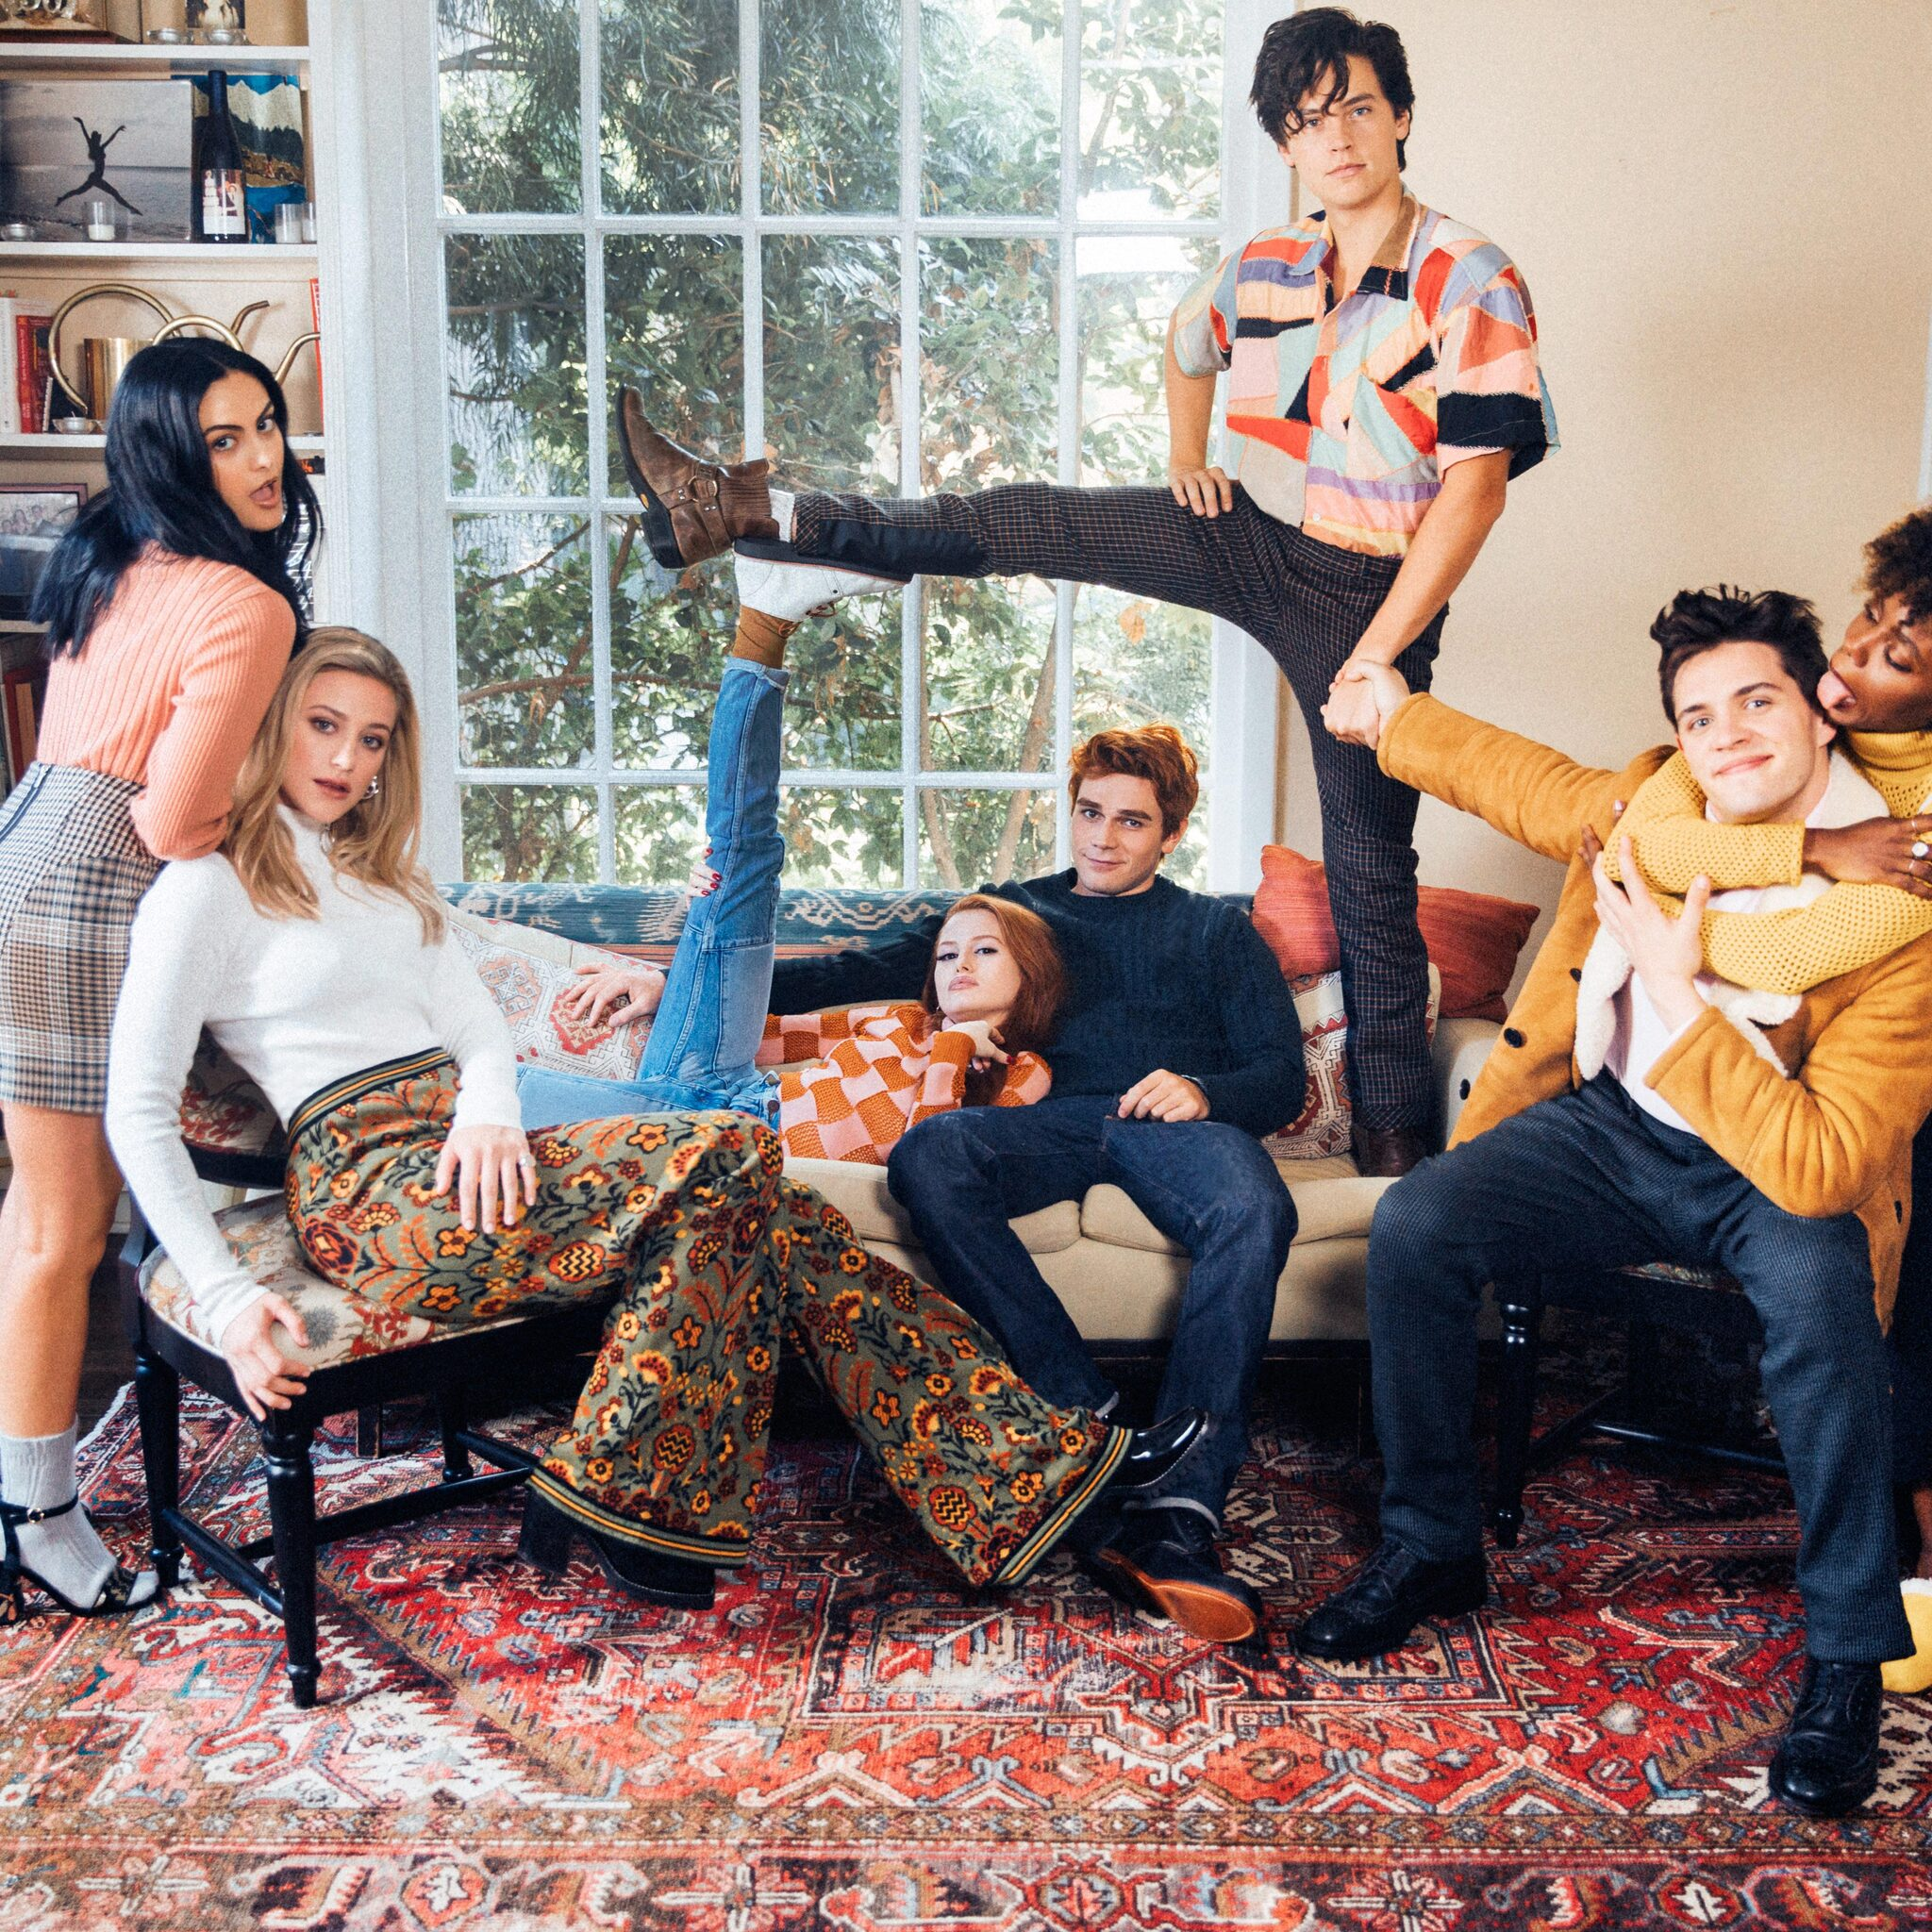 Riverdale Wallpaper: 2048x2048 Riverdale Season 2 Cast Photoshoot 5k Ipad Air